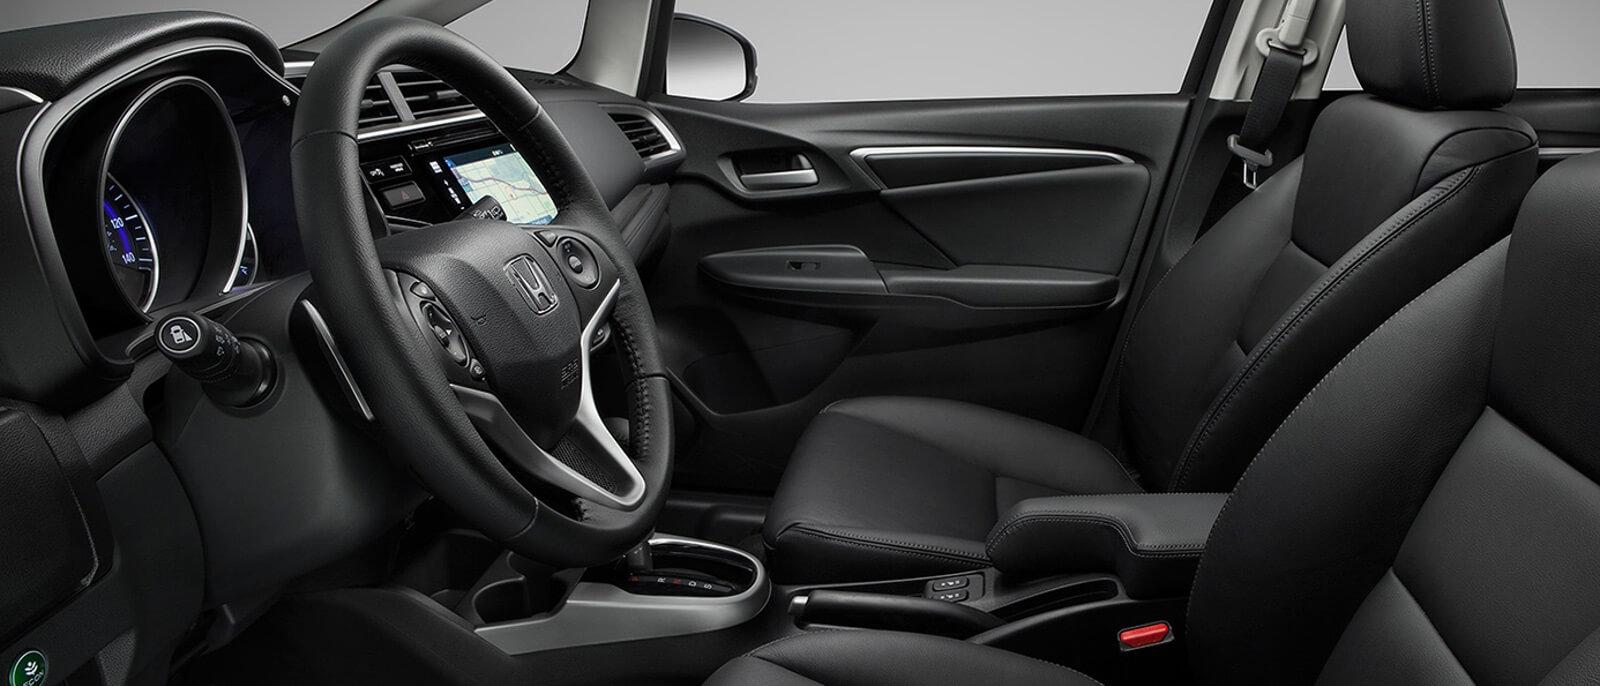 2016 Honda Fit interior